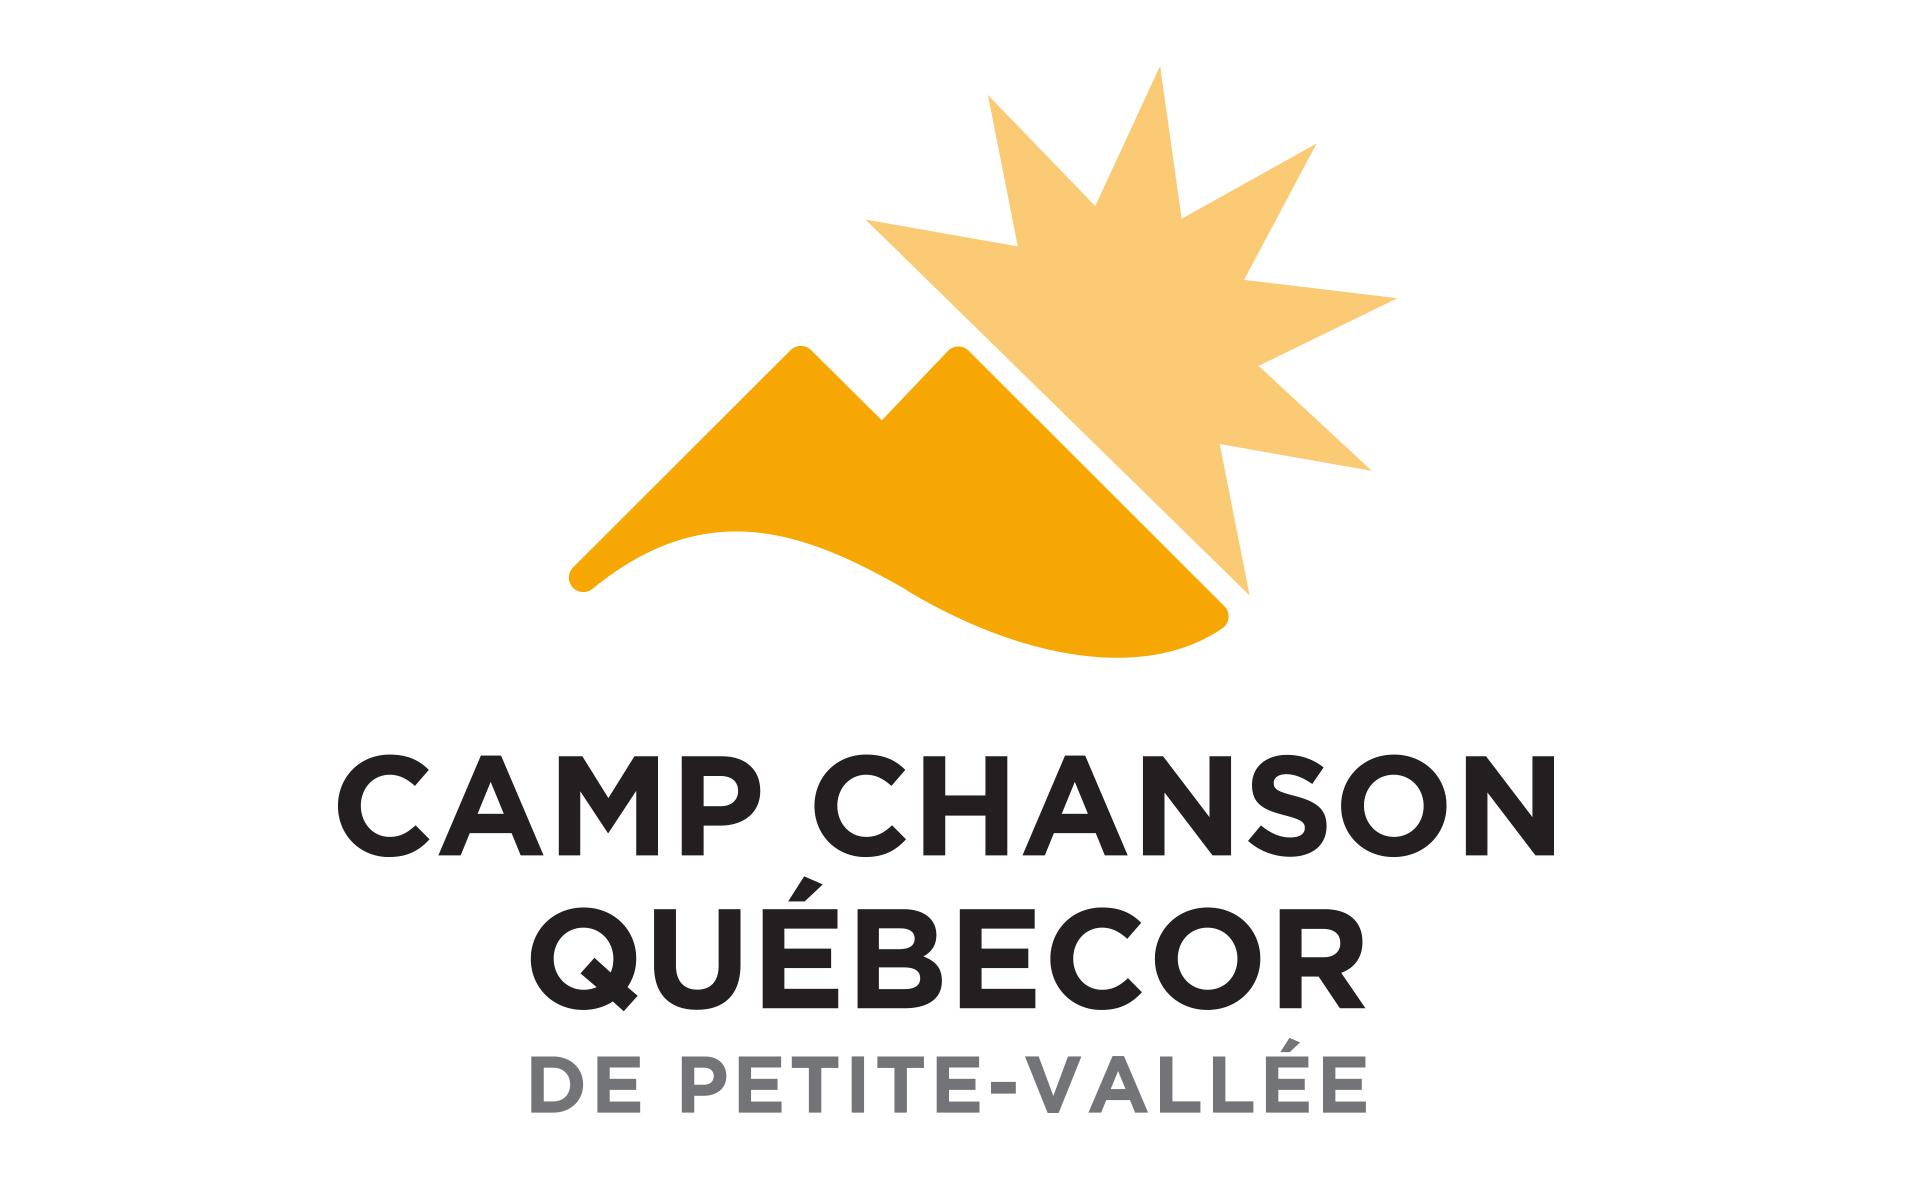 Camp Chanson Petite-Vallée